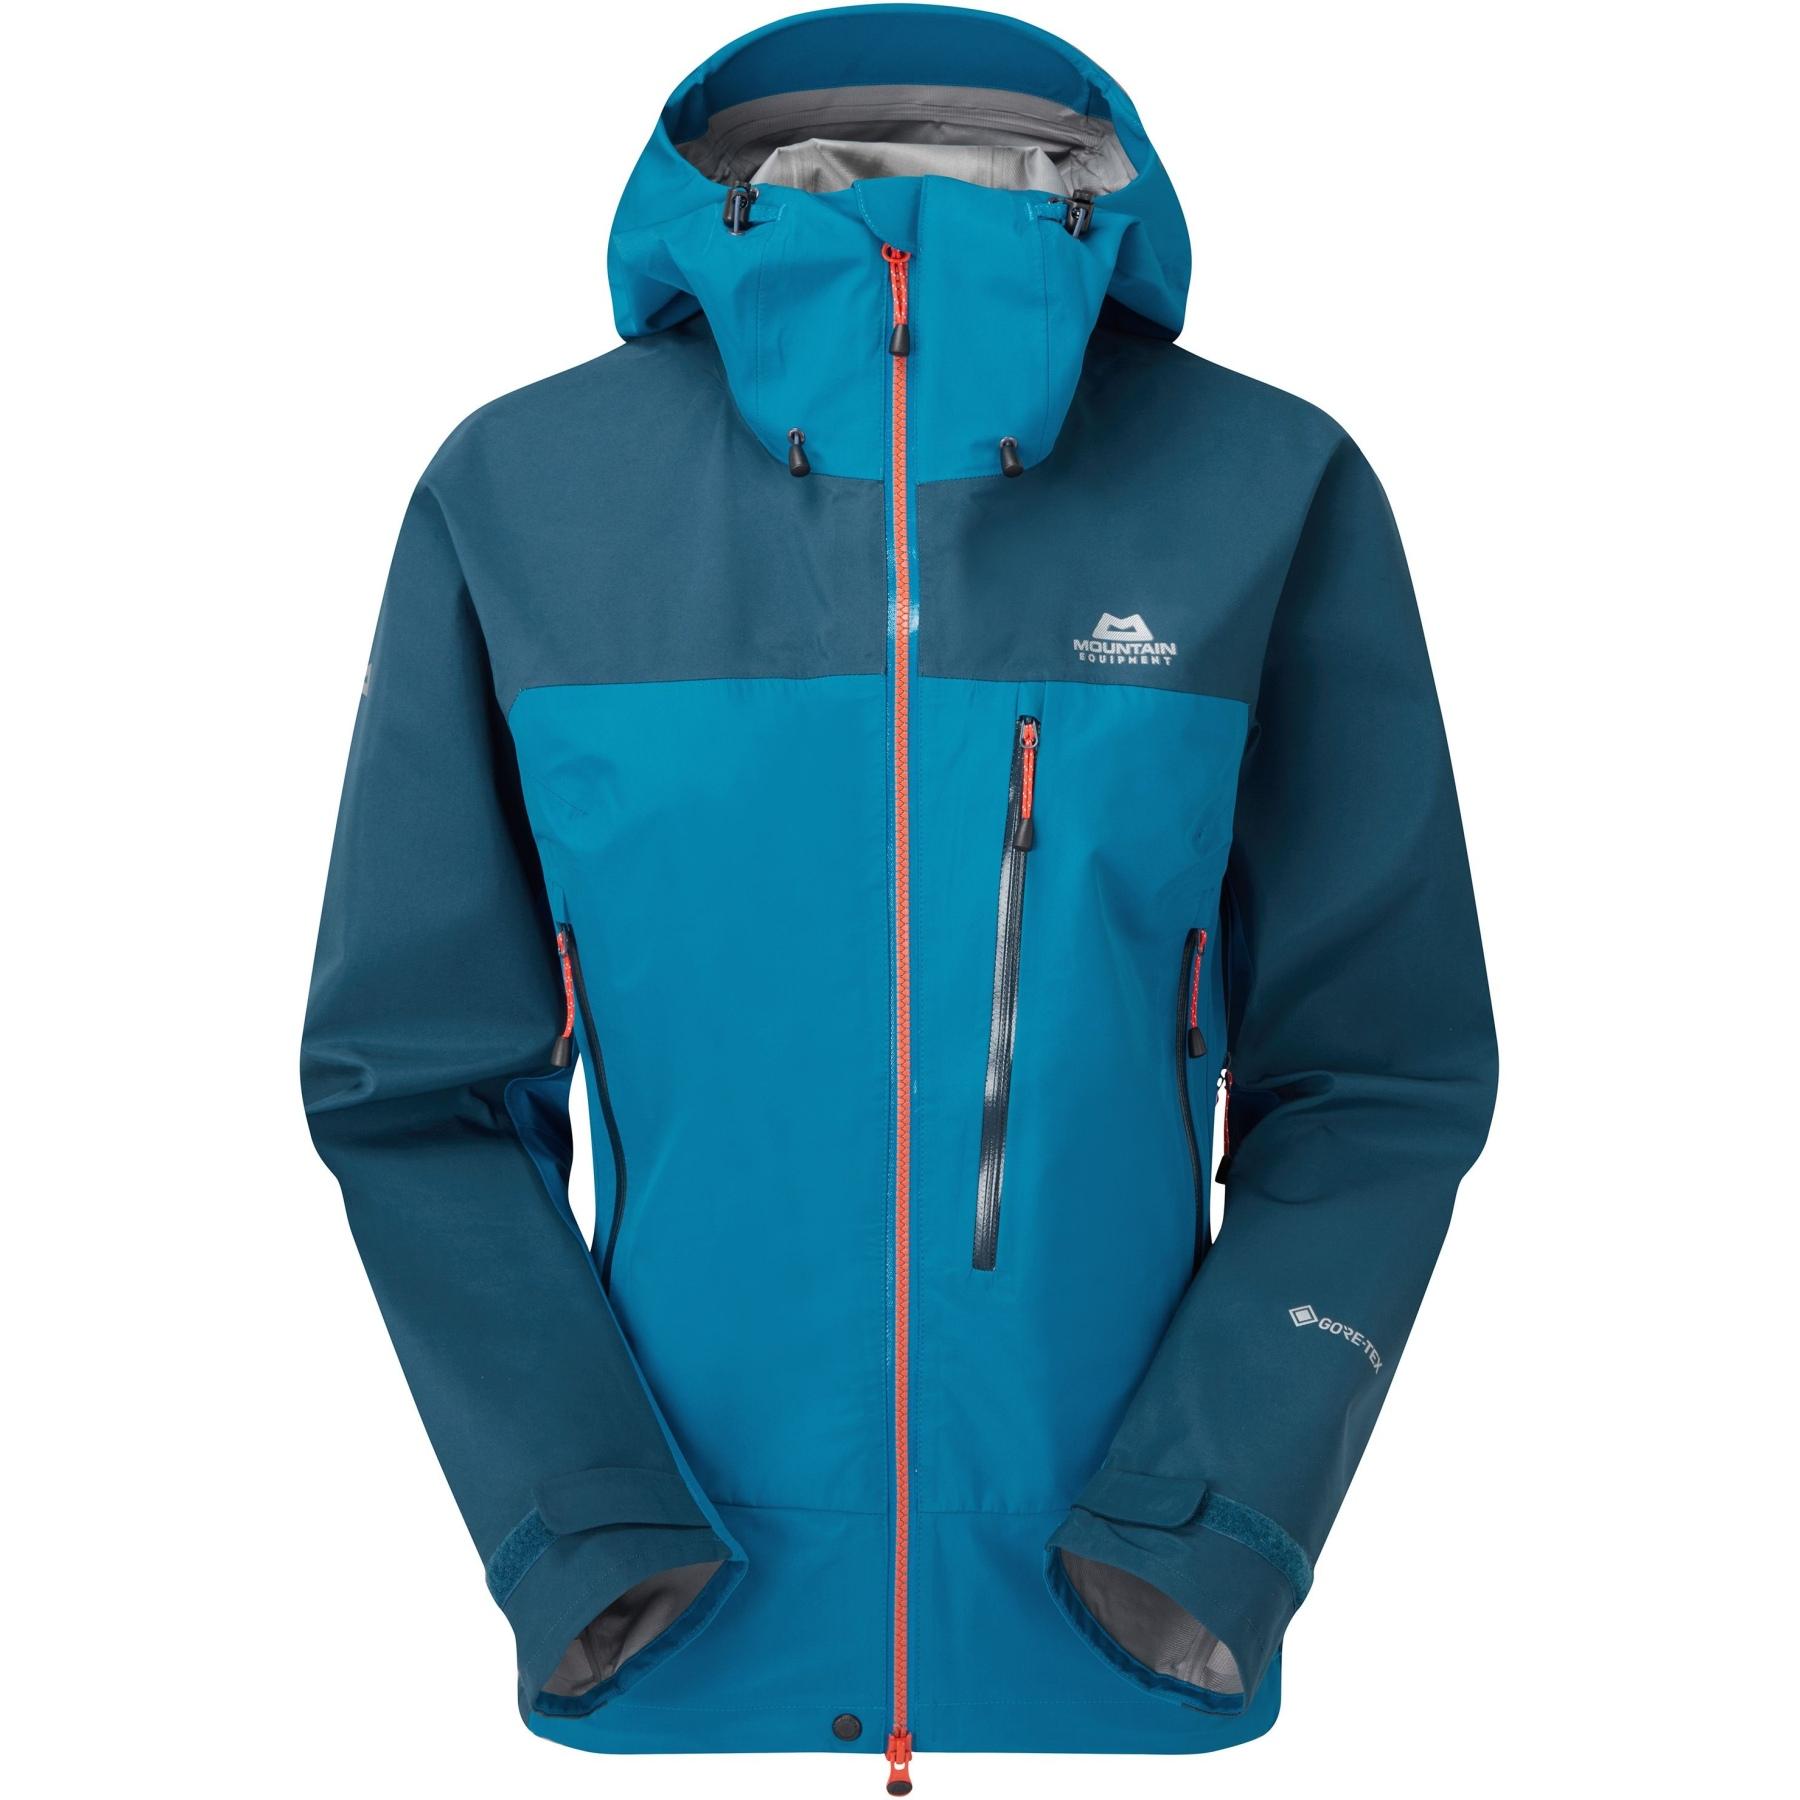 Produktbild von Mountain Equipment Makalu Damenjacke ME-005844 - mykonos blue/majolica blue